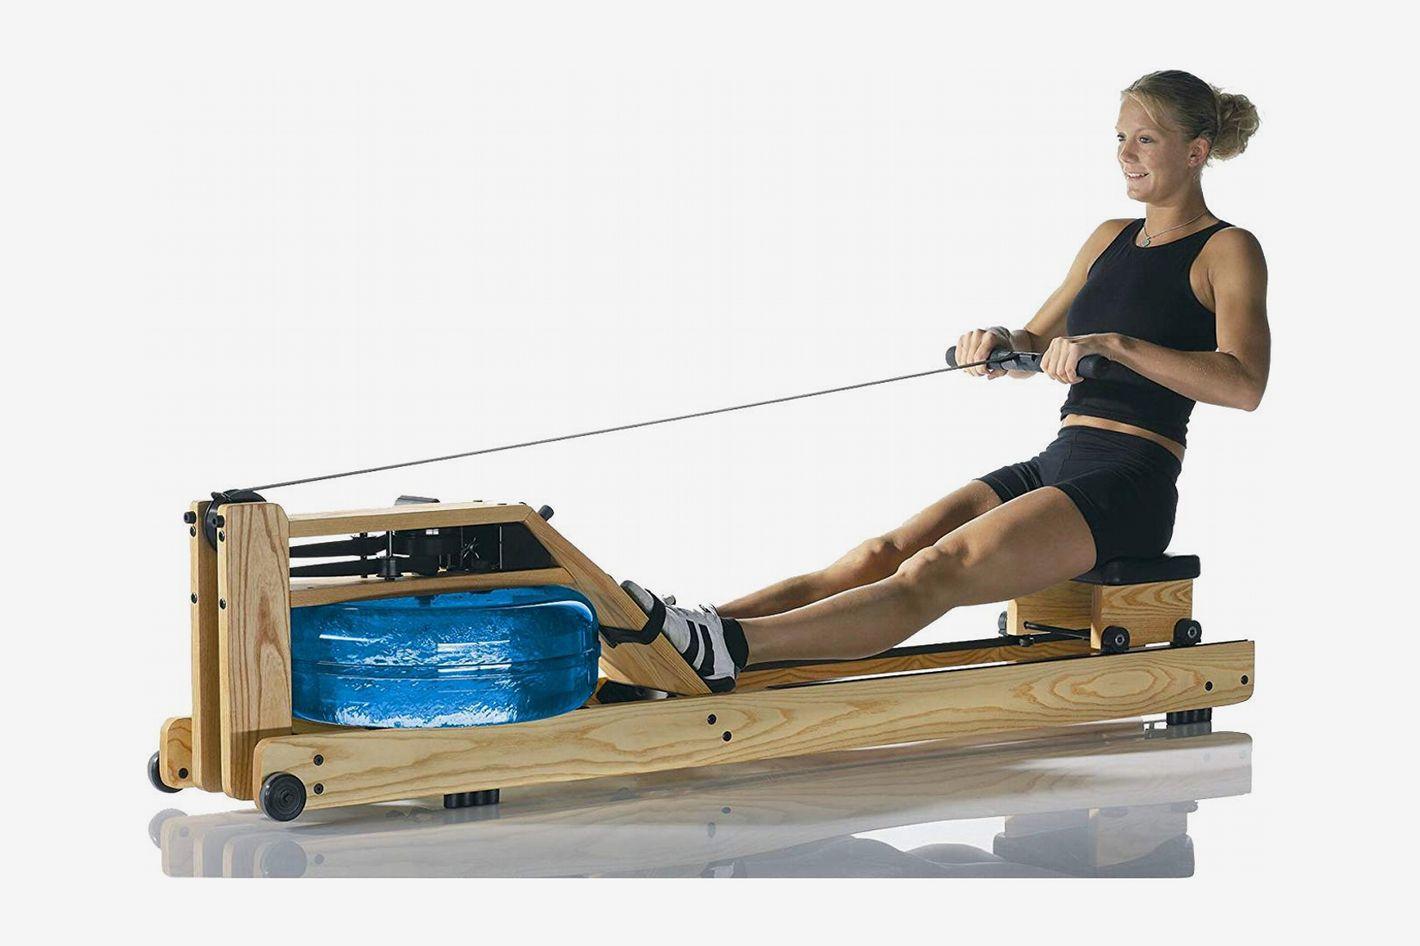 WaterRower Rowing Machine Driftwood With Patented Water Flywheel